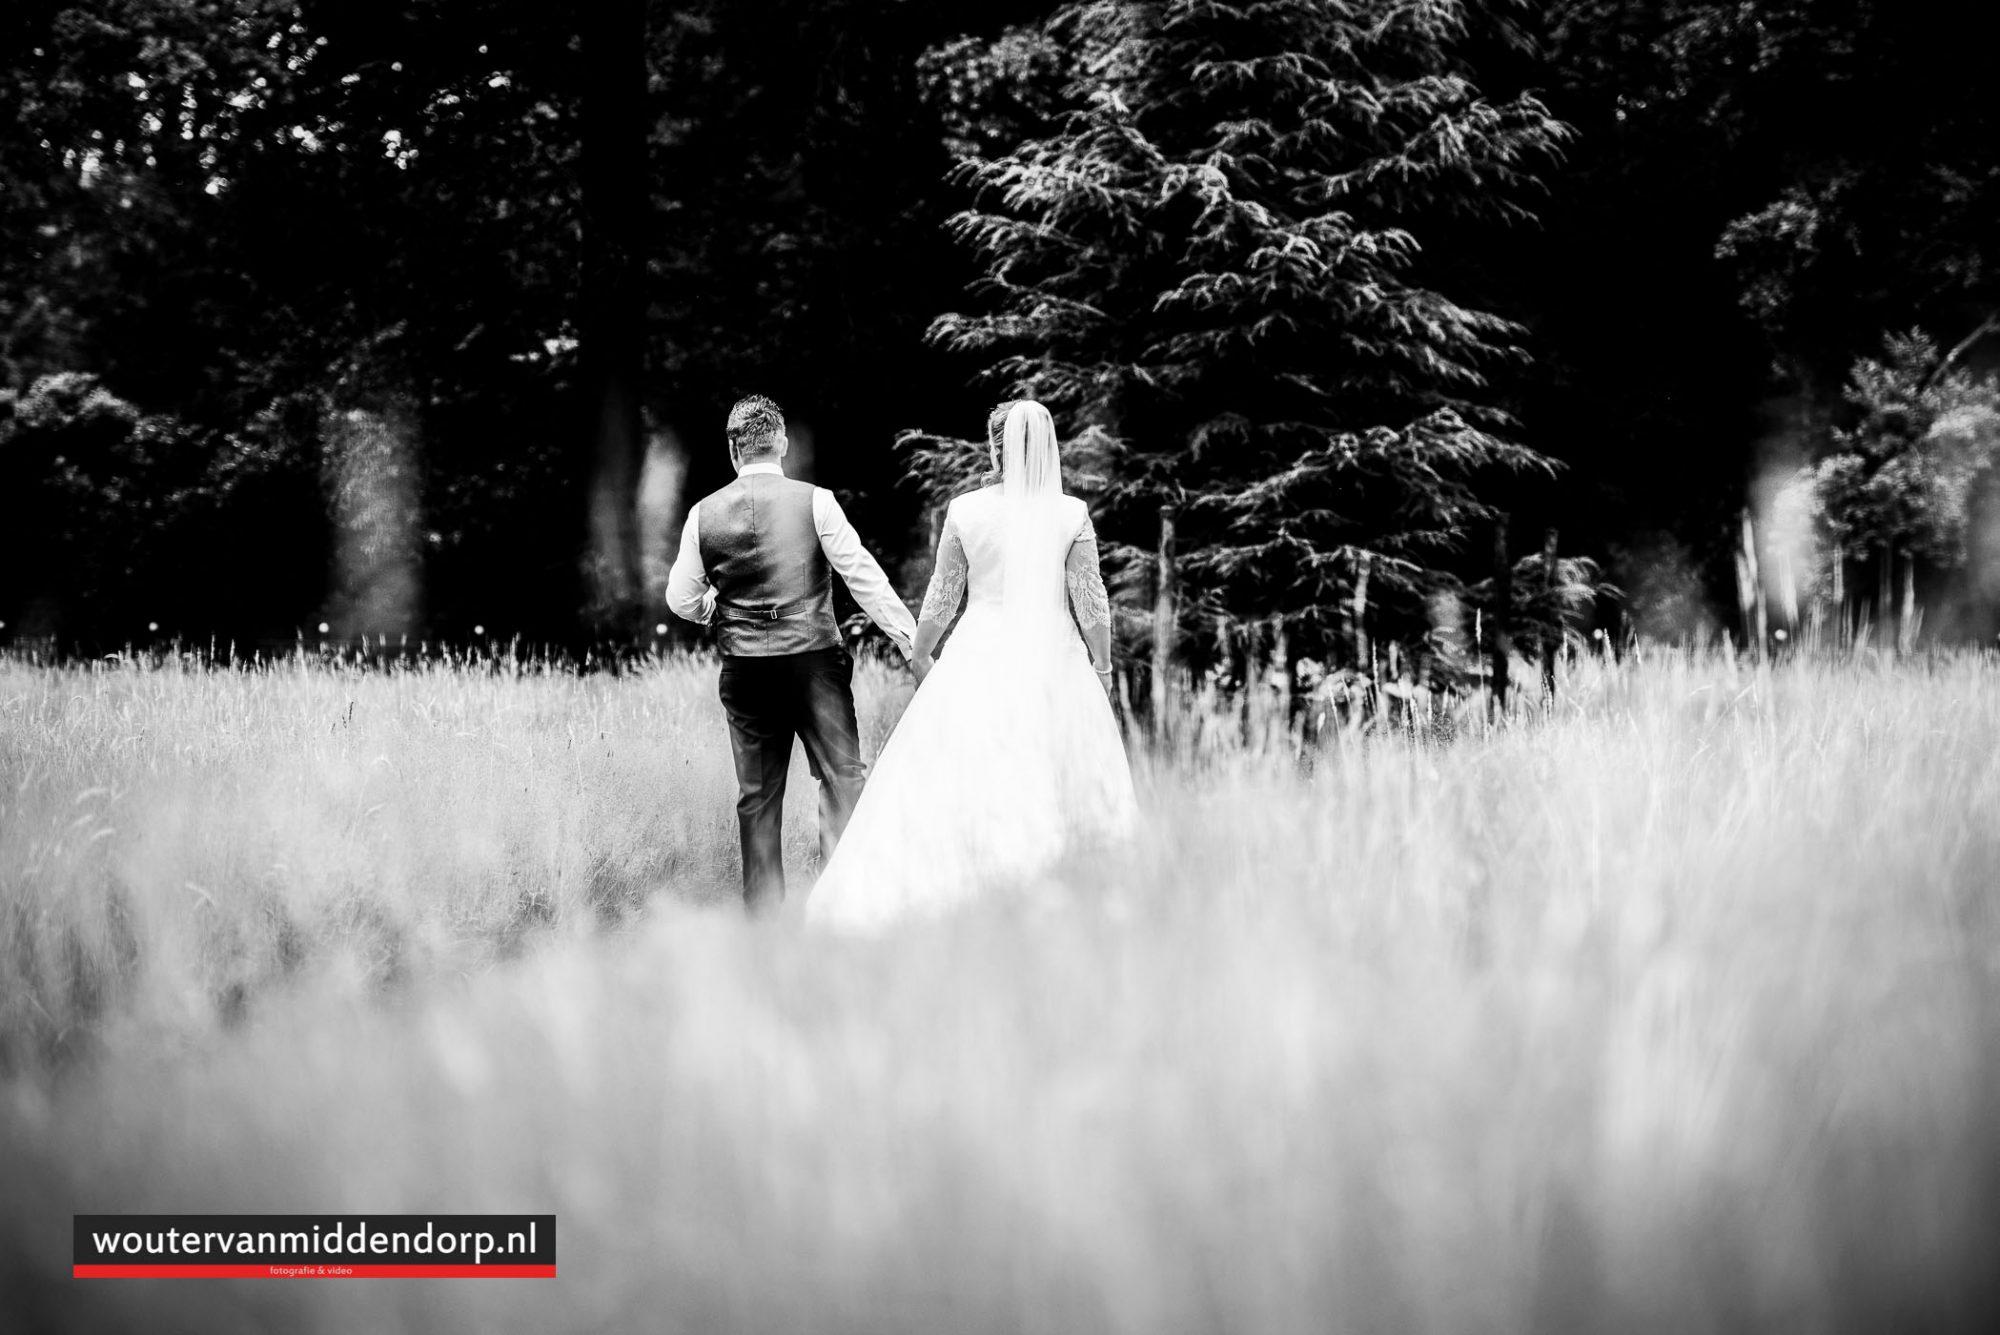 trouwfotograaf-wouter-van-middendorp-omgeving-veluwe-barneveld-uddel-32-van-51